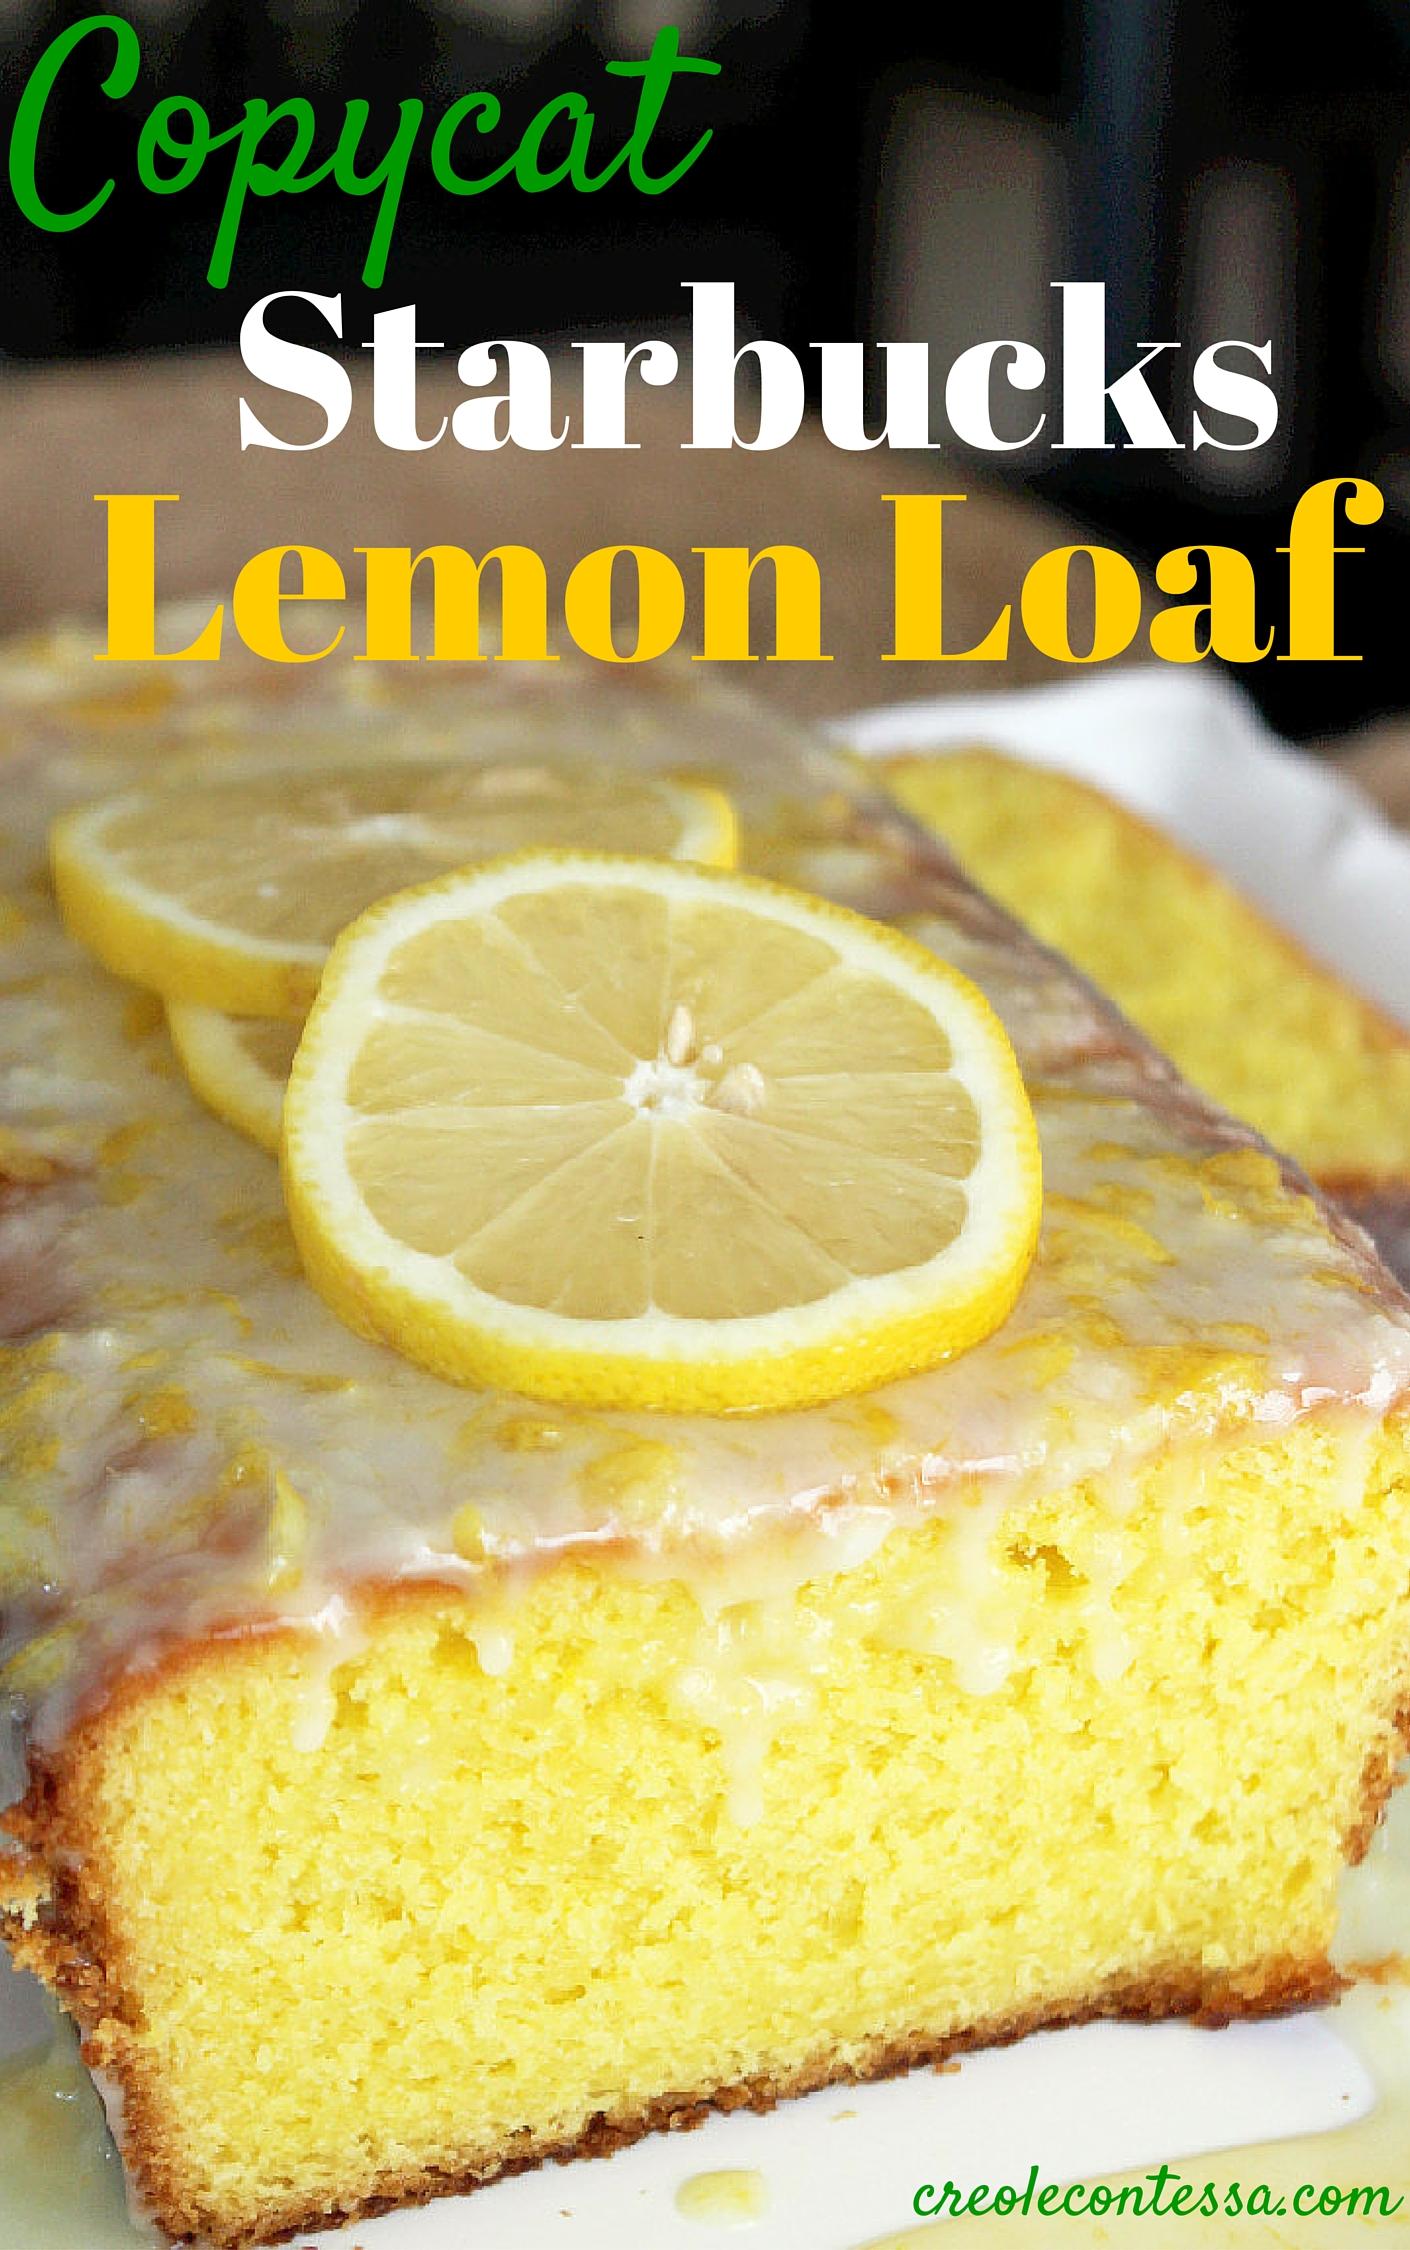 Copycat Starbucks Lemon Loaf Cake-Creole Contessa